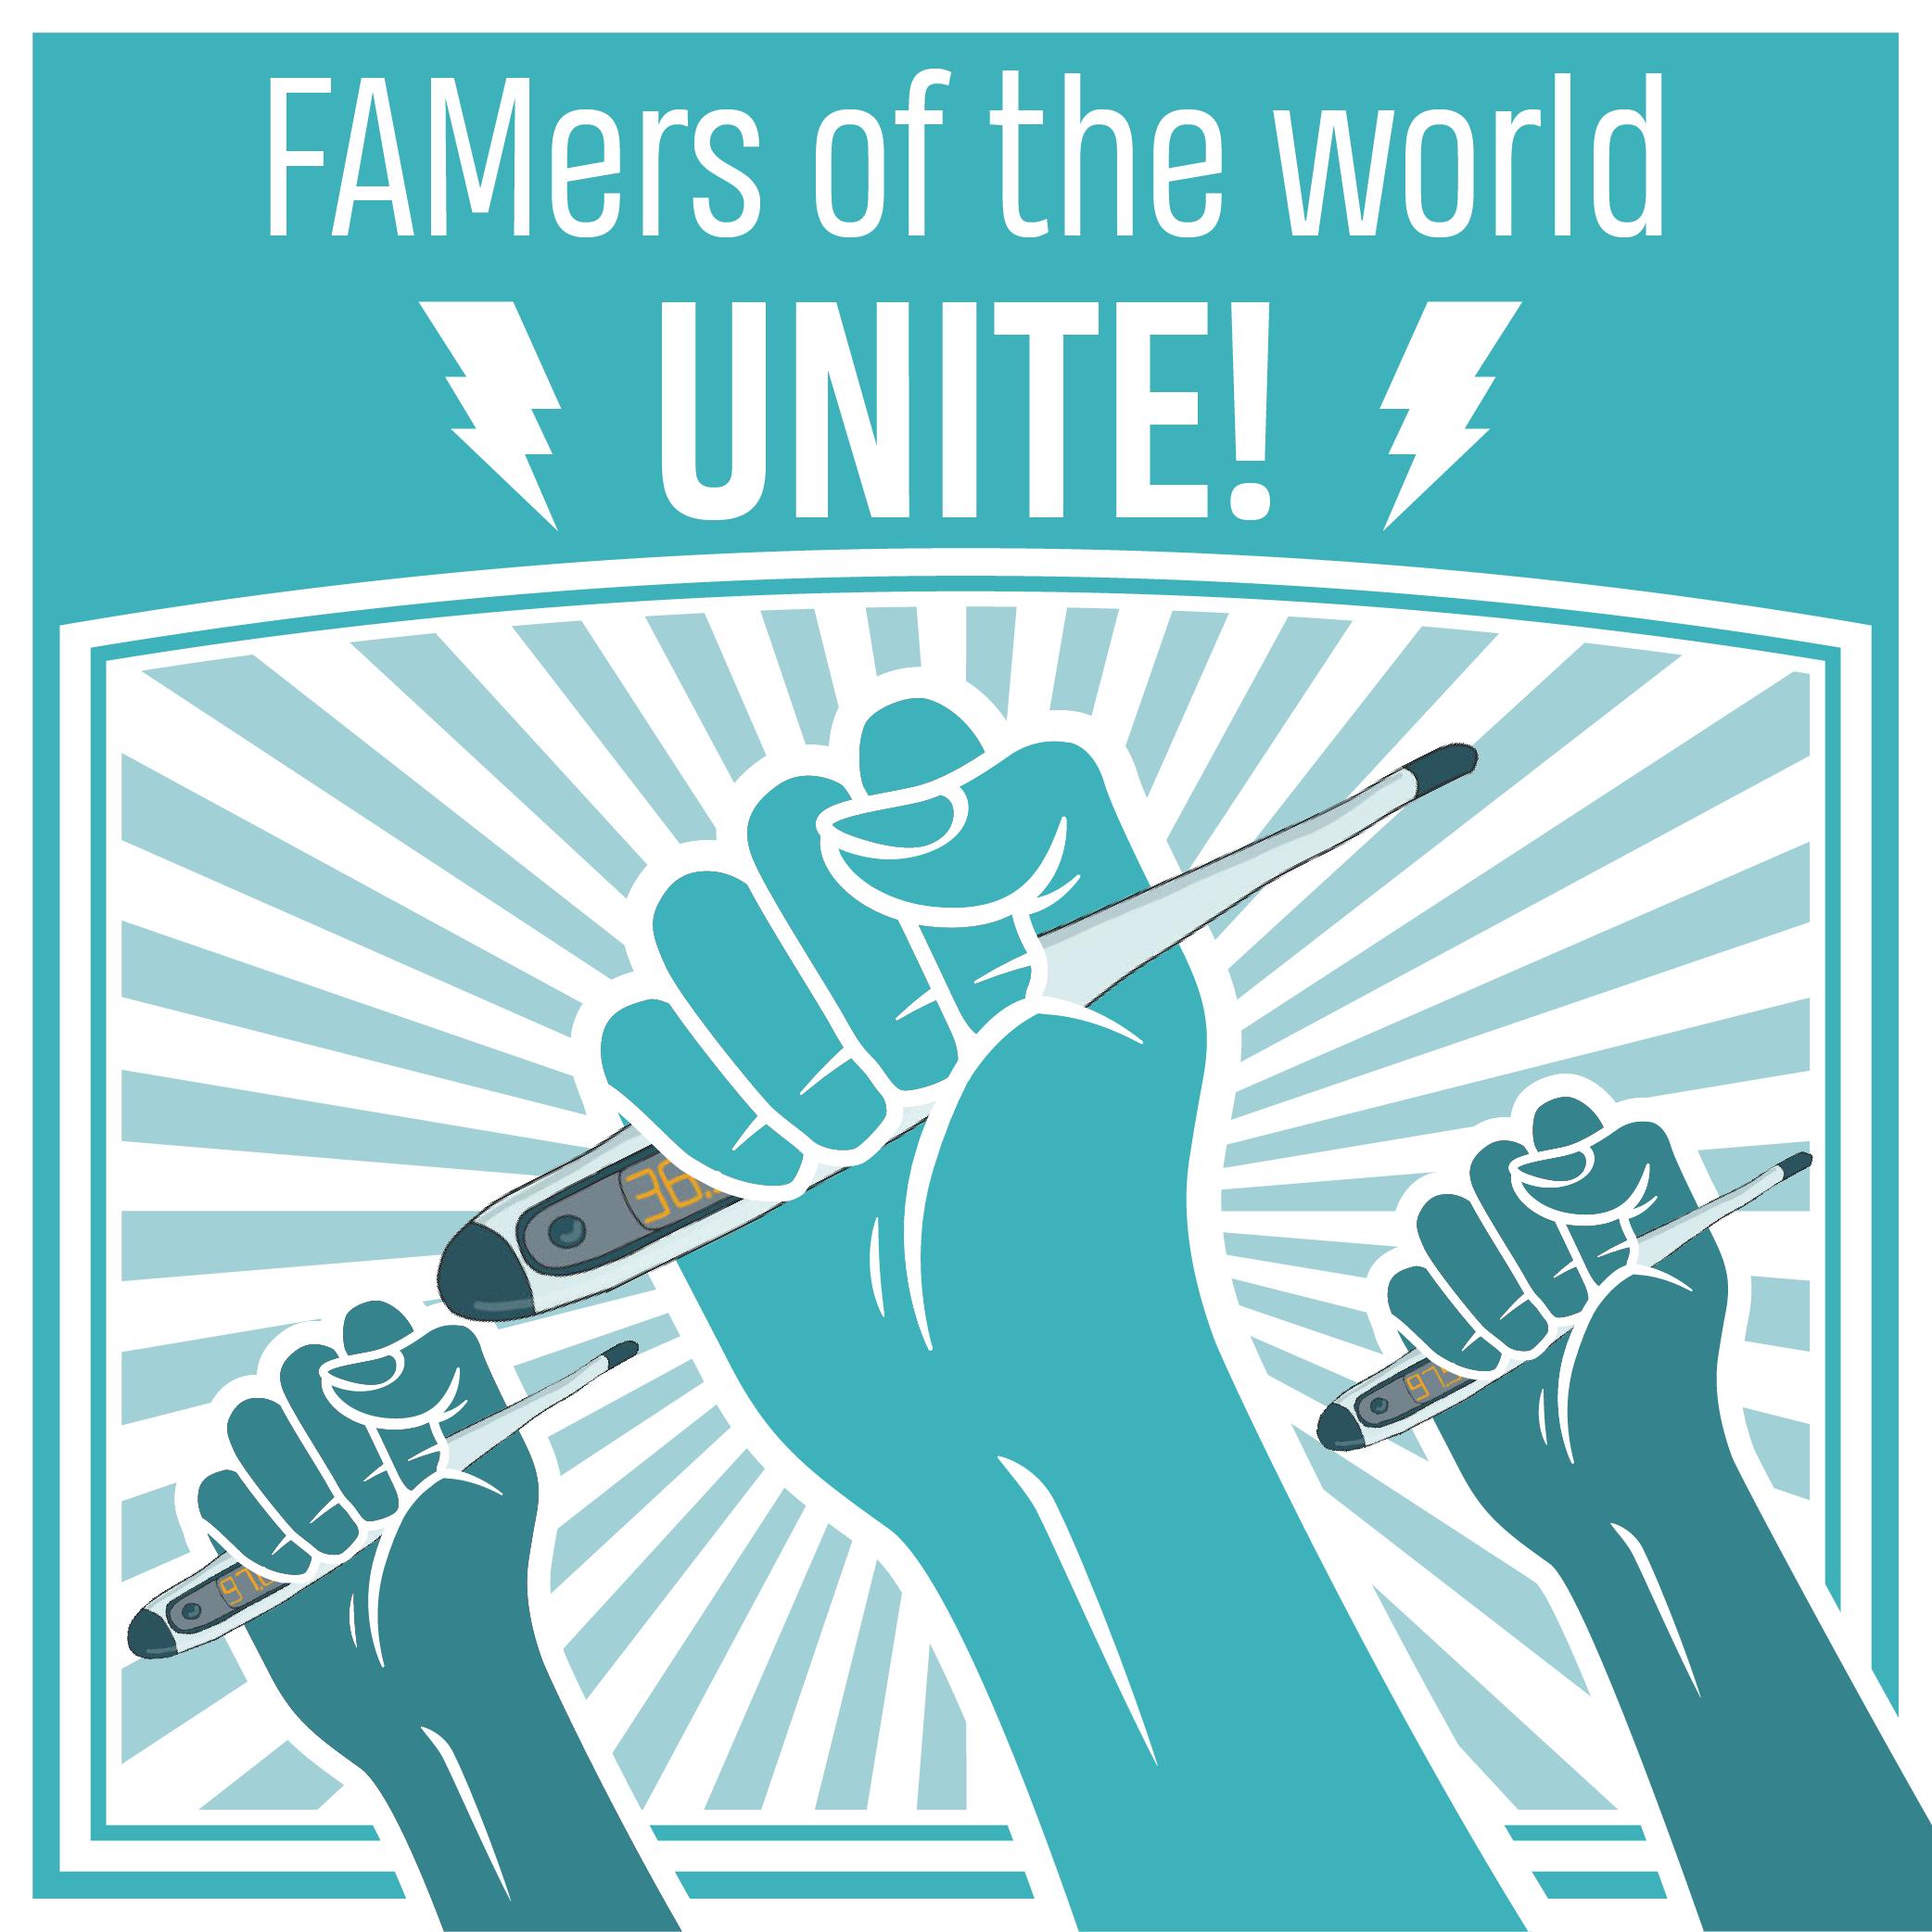 FAMers unite.png